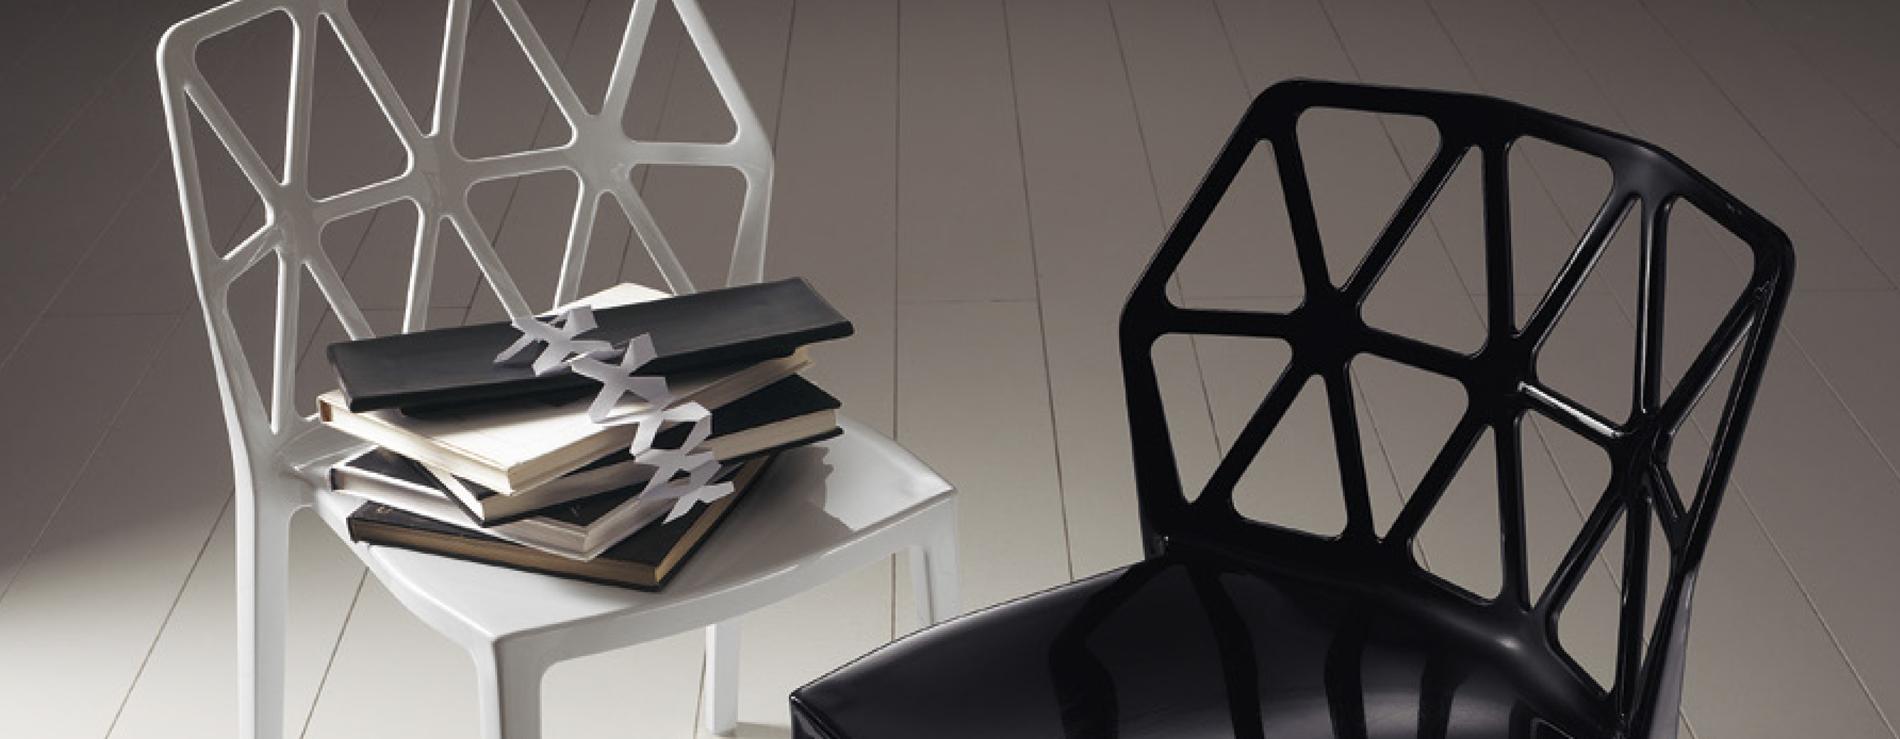 Tavoli - sedie - sgabelli moderni - Scavolini - Centro Mobili